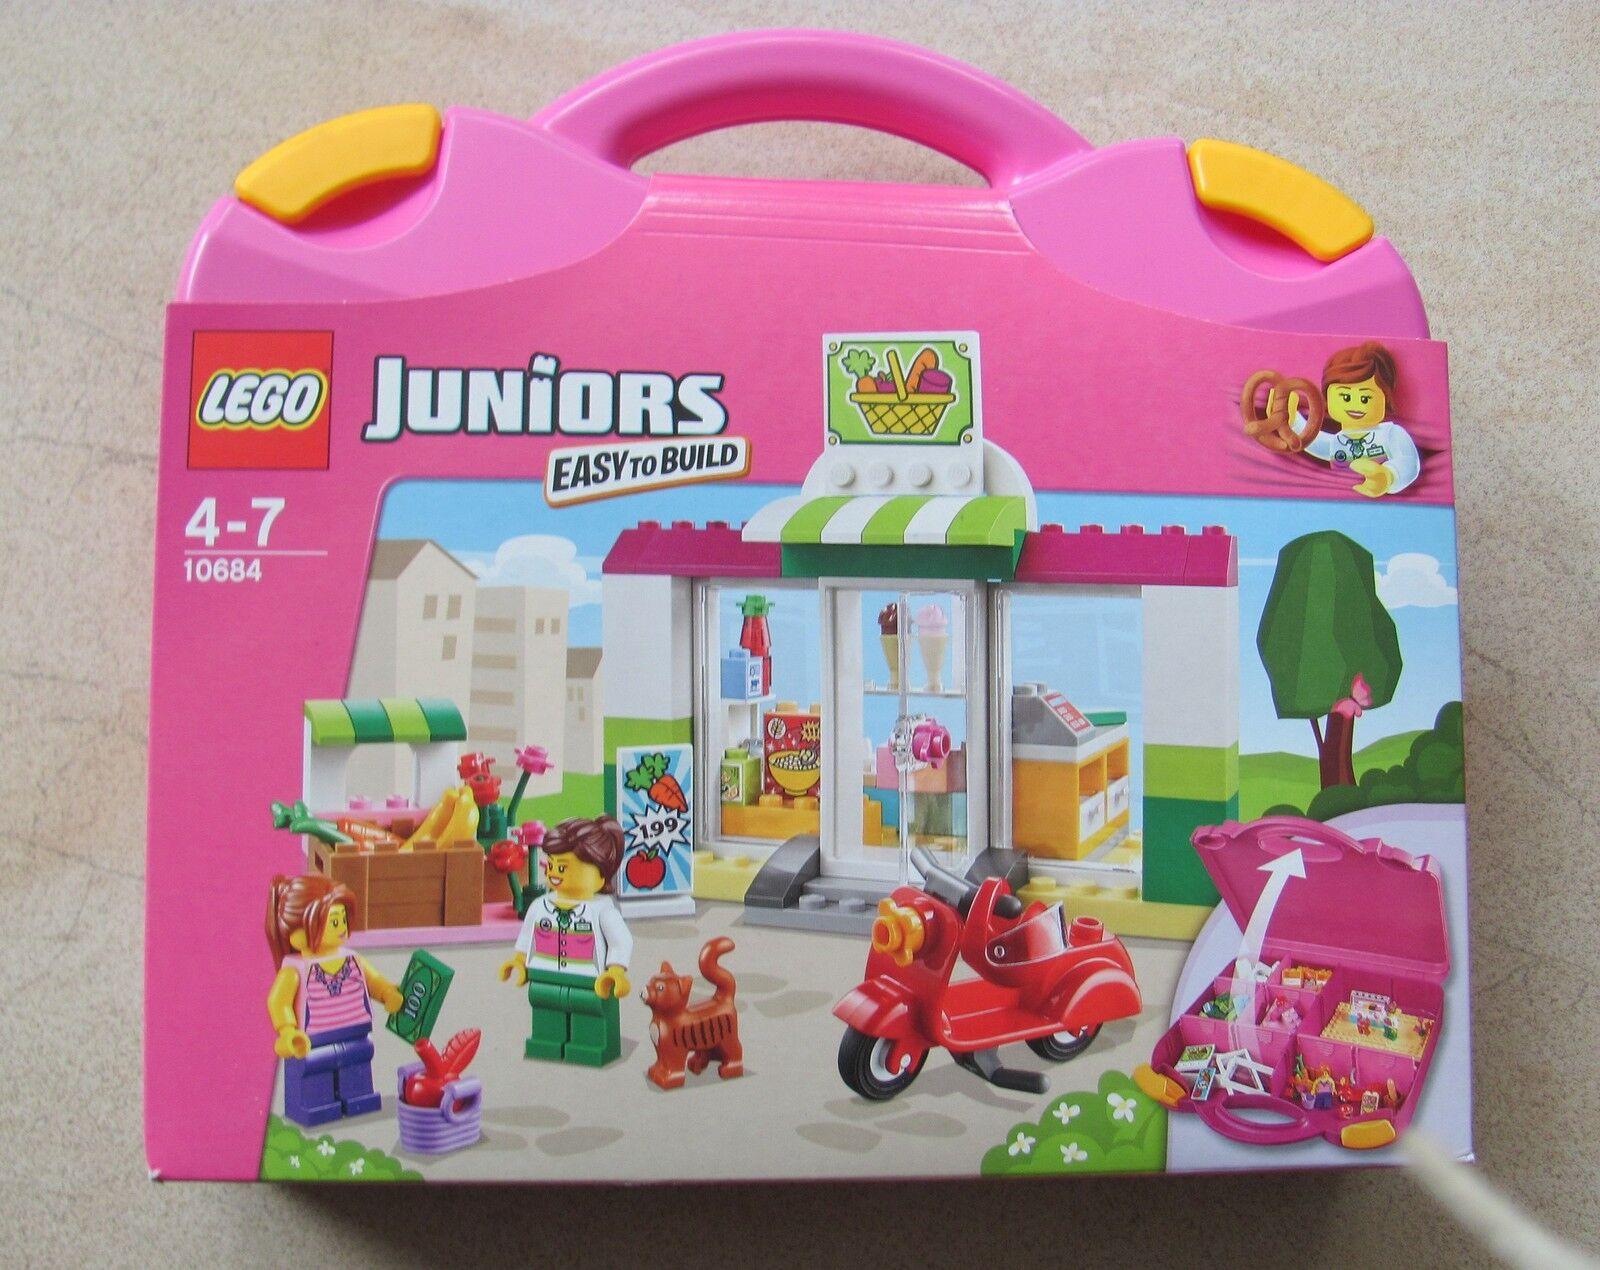 Lego juniors 10684 supermercado-maleta maleta maleta Bag nuevo con embalaje embalaje embalaje original  8ecb40